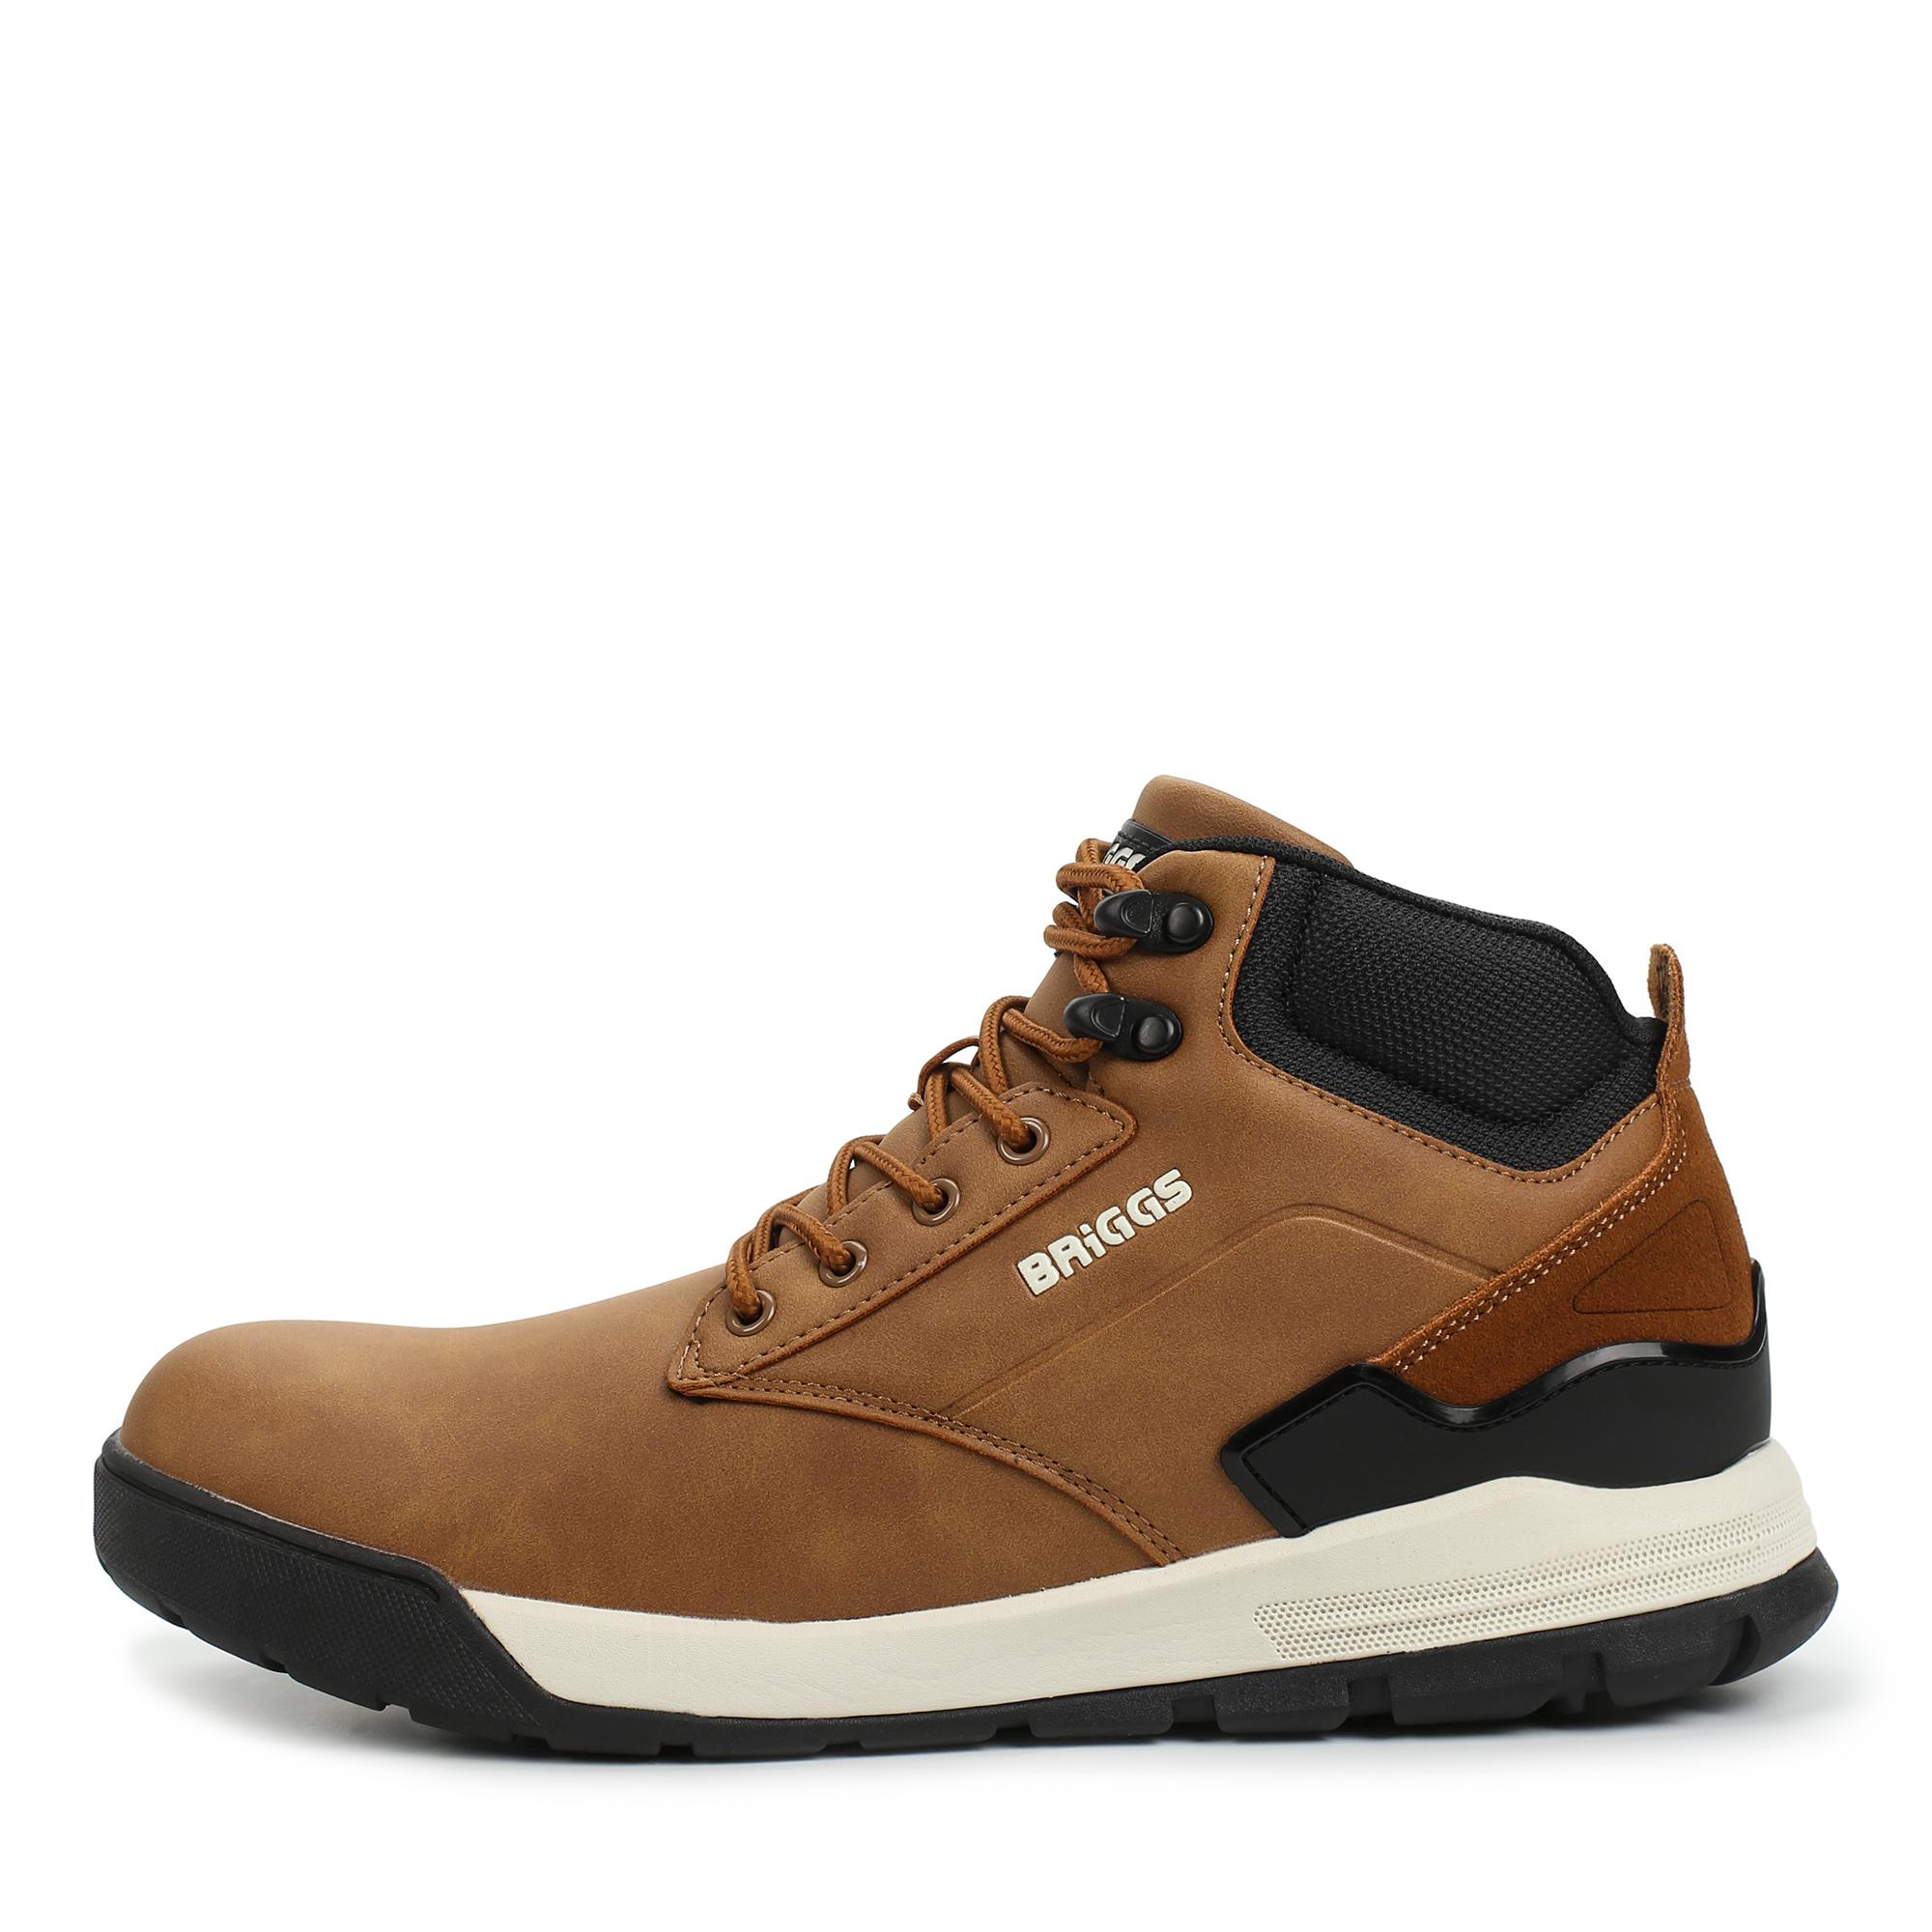 Ботинки BRIGGS 050-033A-2609